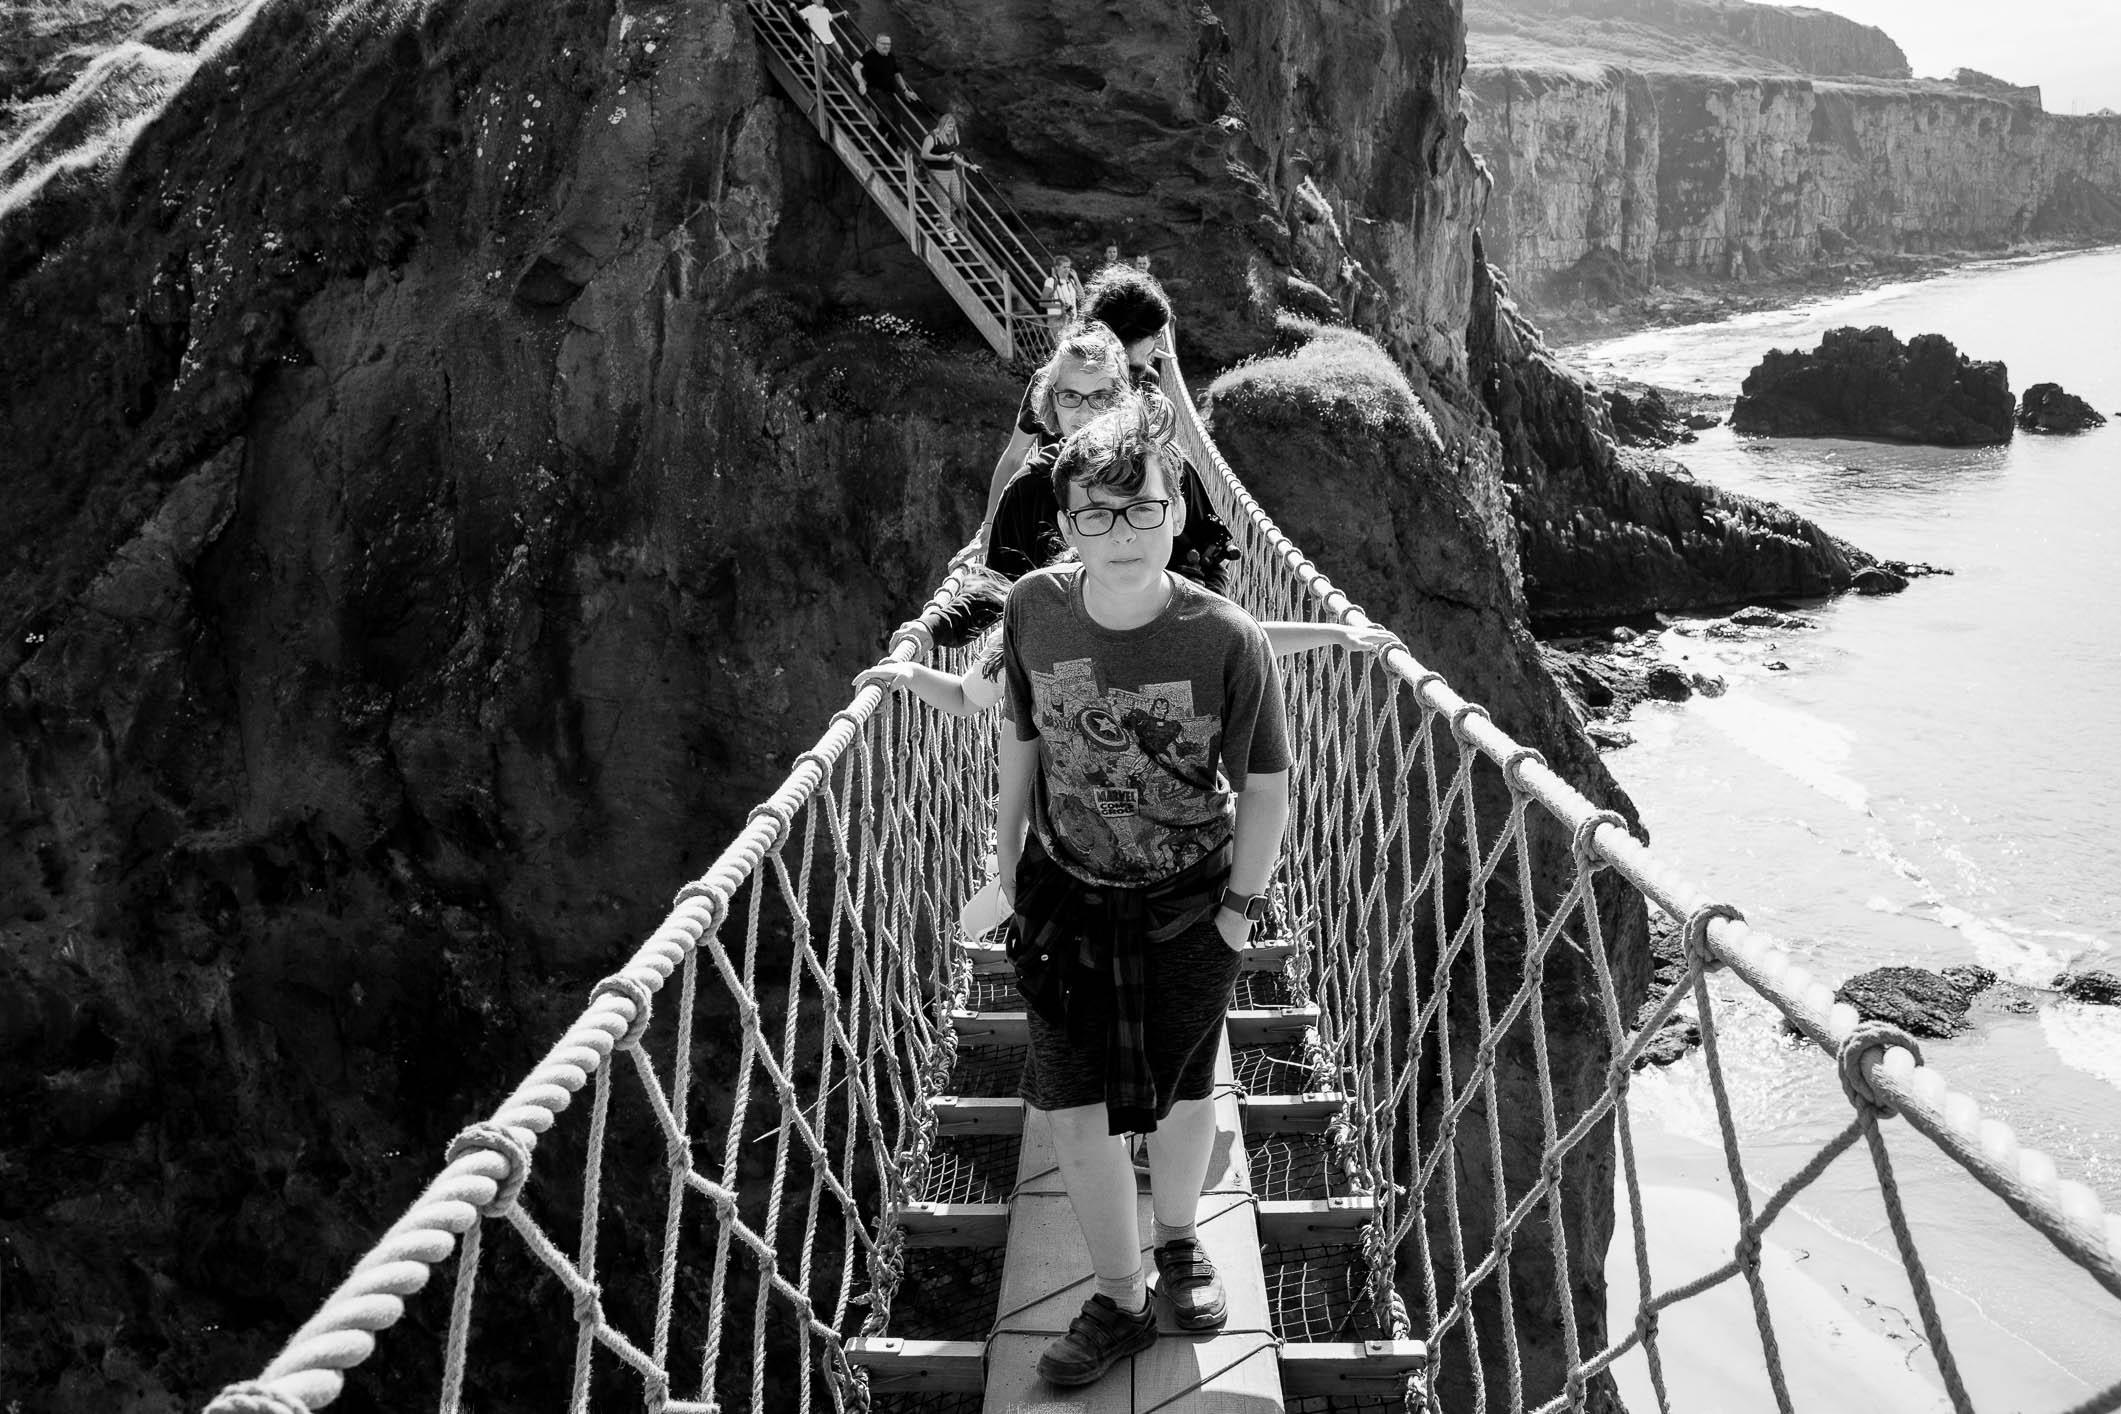 Carrick-a-rede rope bridge-.jpg